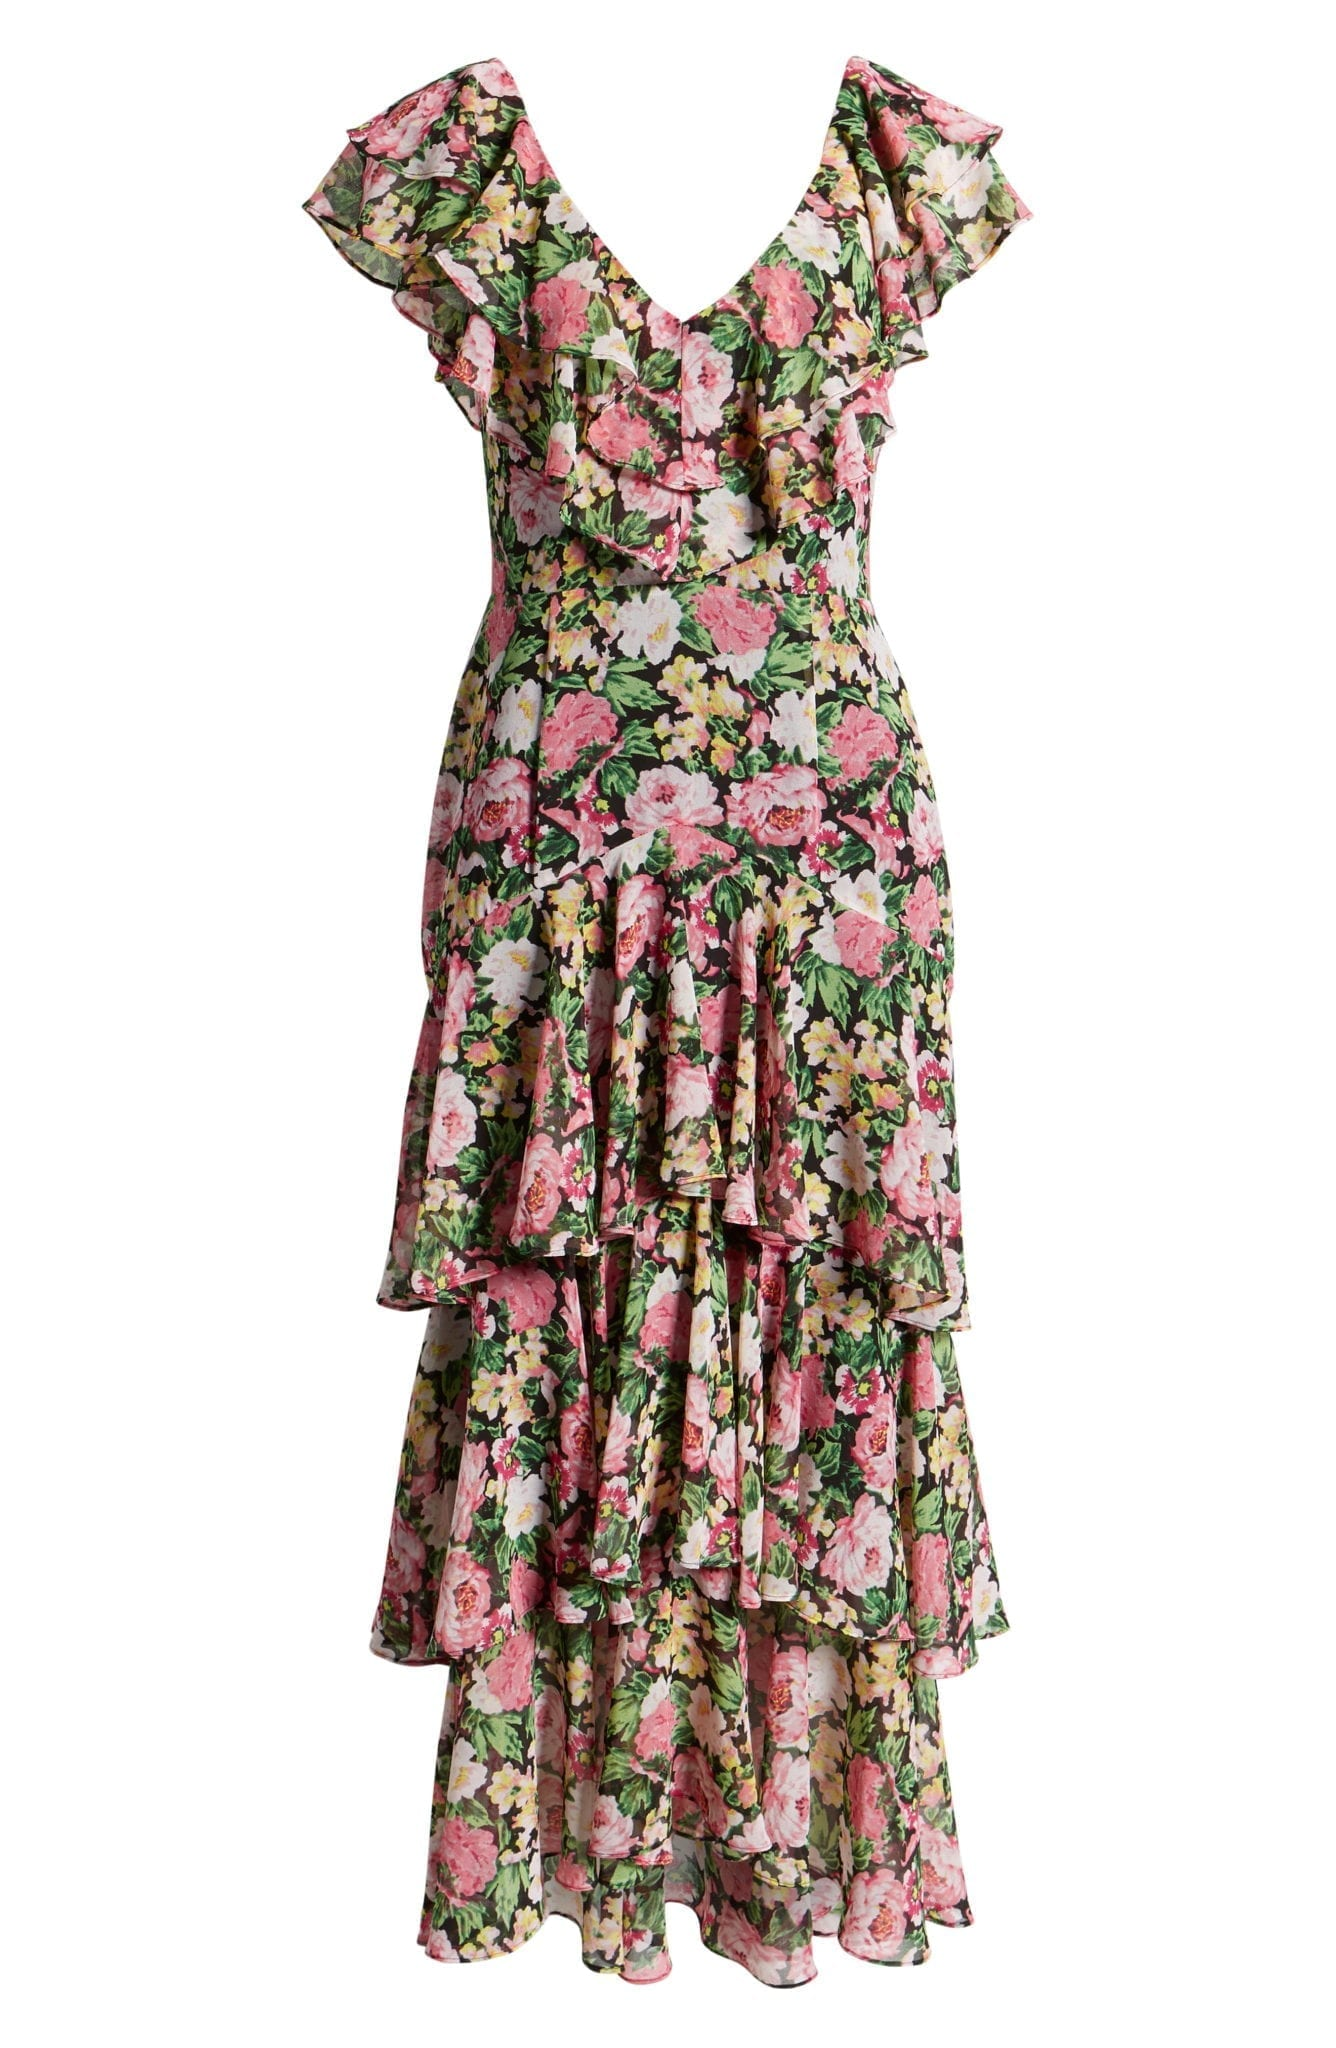 3750ef9a6d0c4 WAYF Chelsea Tiered Ruffle Maxi Black Dress - We Select Dresses